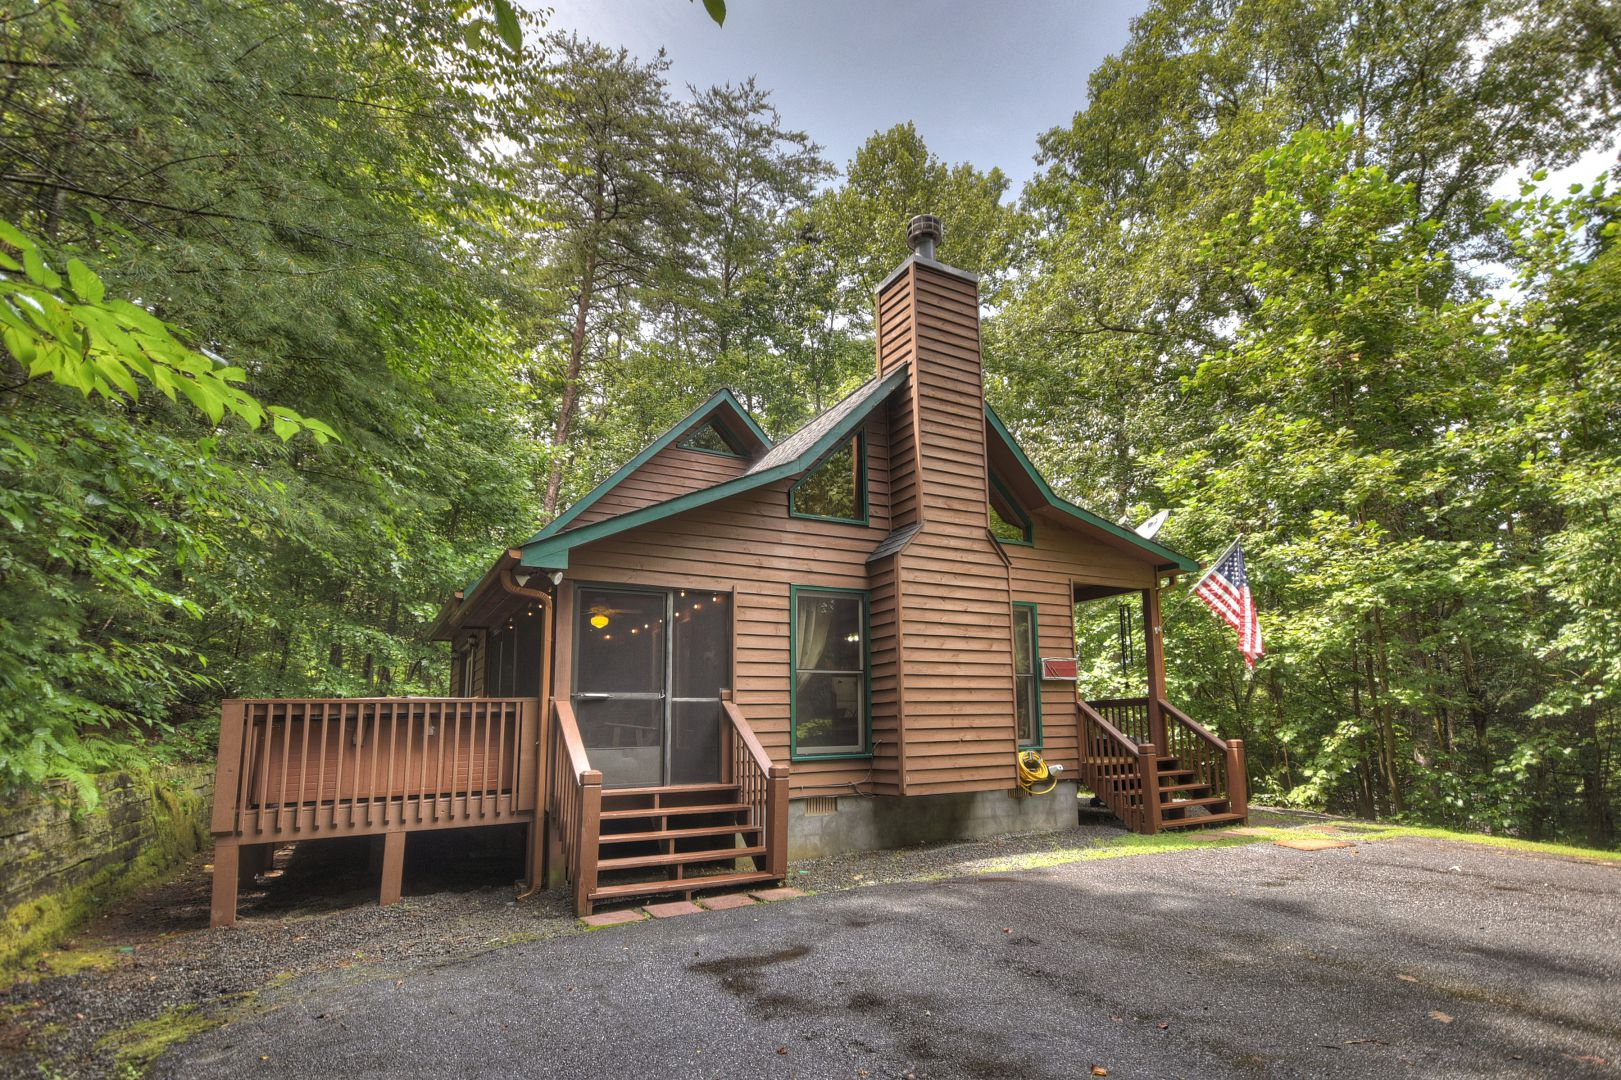 Snuggle Inn Rental Cabin